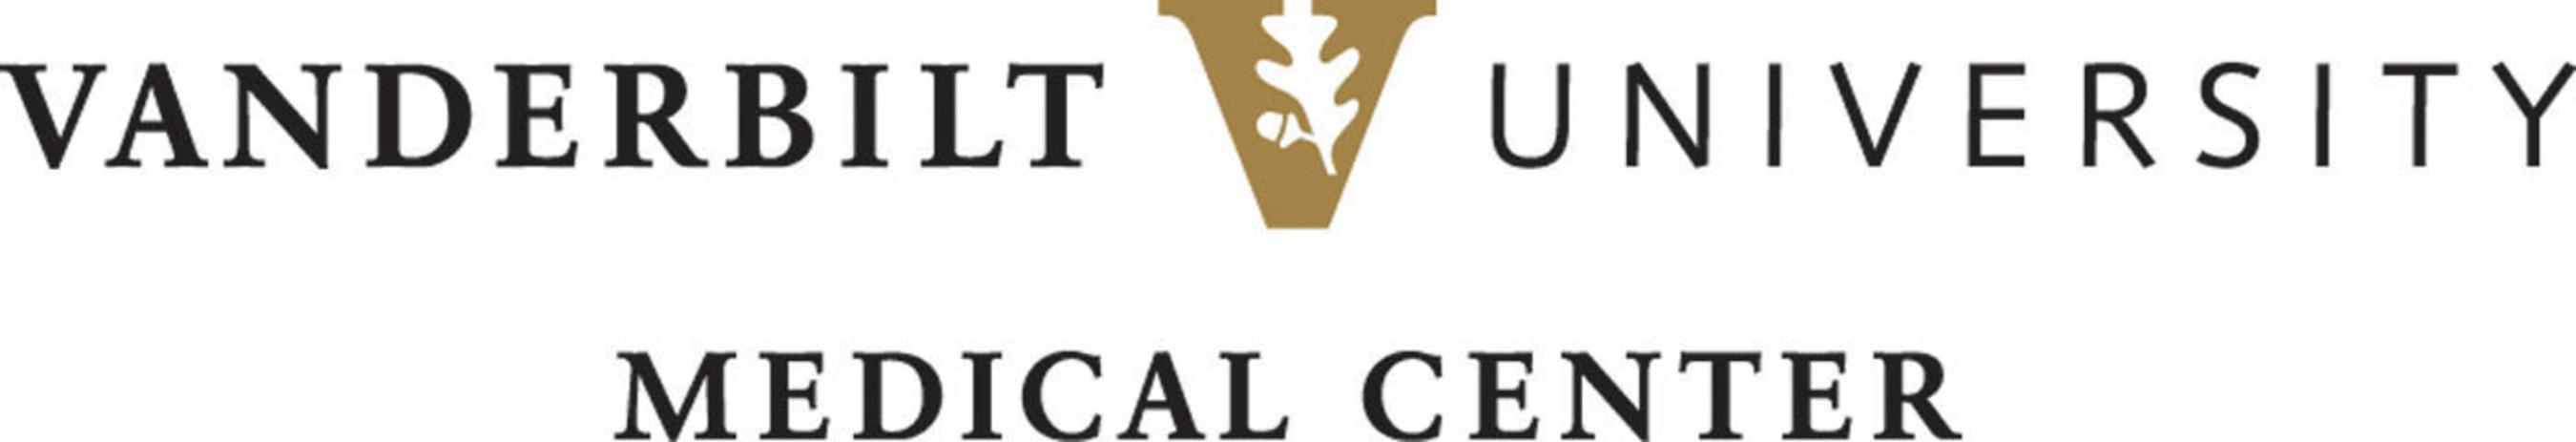 Vanderbilt University Medical Center logo. (PRNewsFoto/Gary and Mary West Health Institute) (PRNewsFoto/GARY AND MARY WEST HEALTH INST)